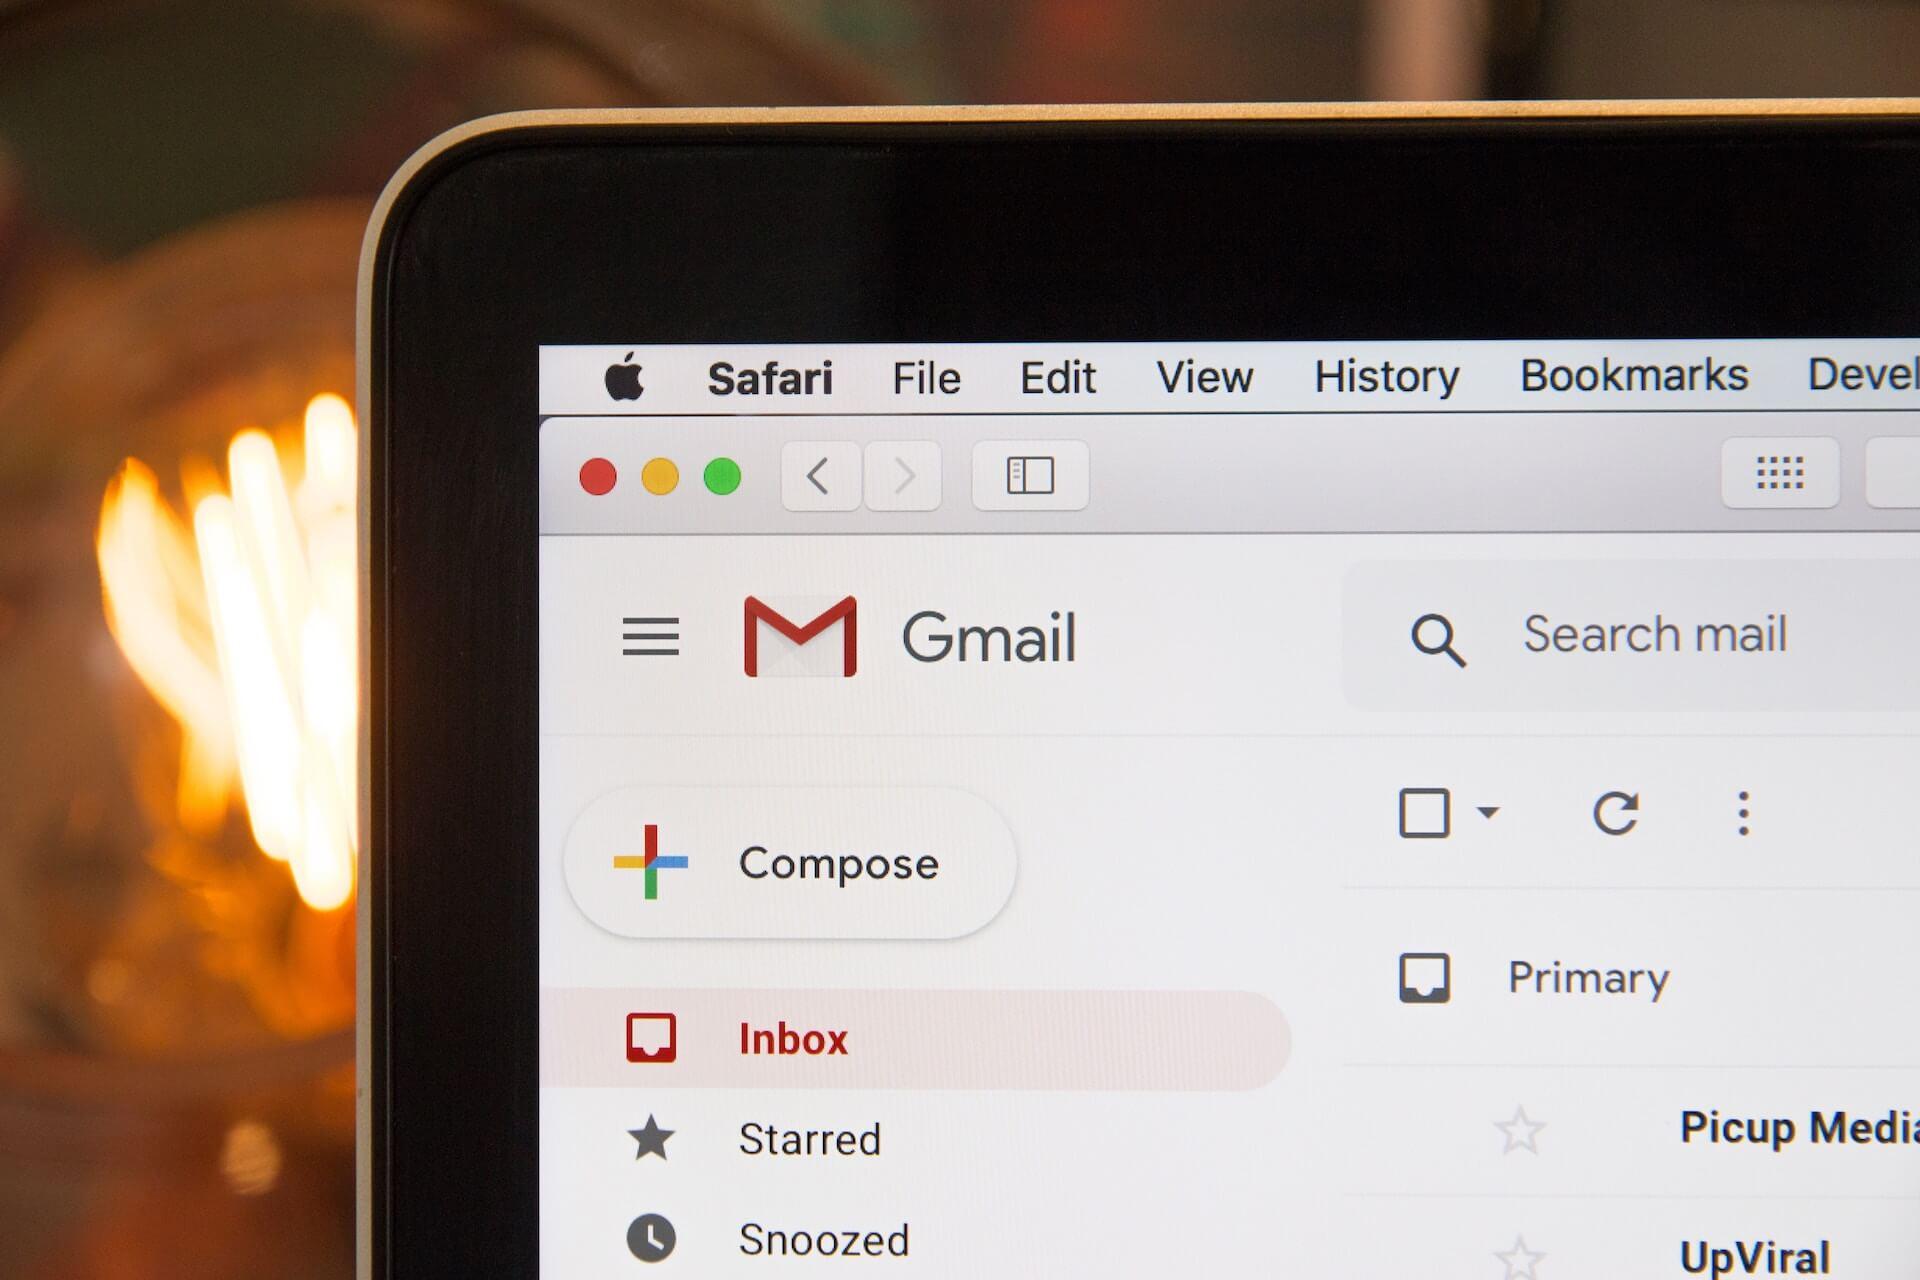 Gmailもお盆休み?アジアを中心に通信障害が発生か technology190816-gmail